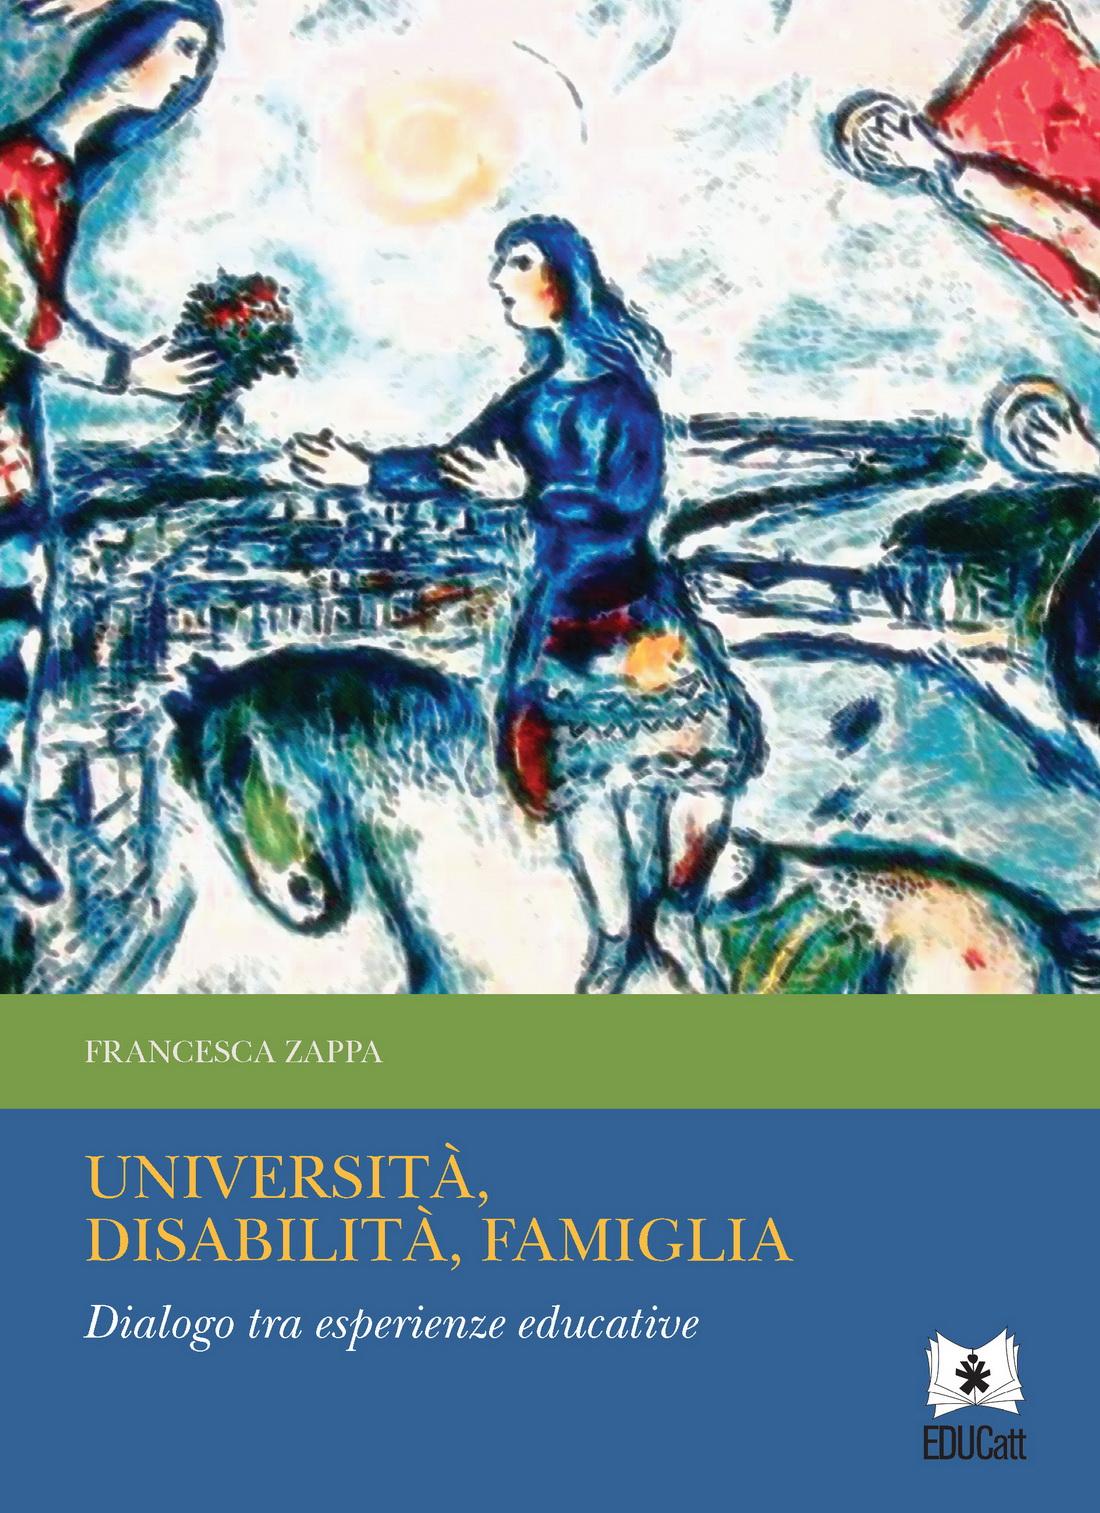 UNIVERSITA', DISABILITA', FAMIGLIA. DIALOGO TRA ESPERIENZE EDUCATIVE